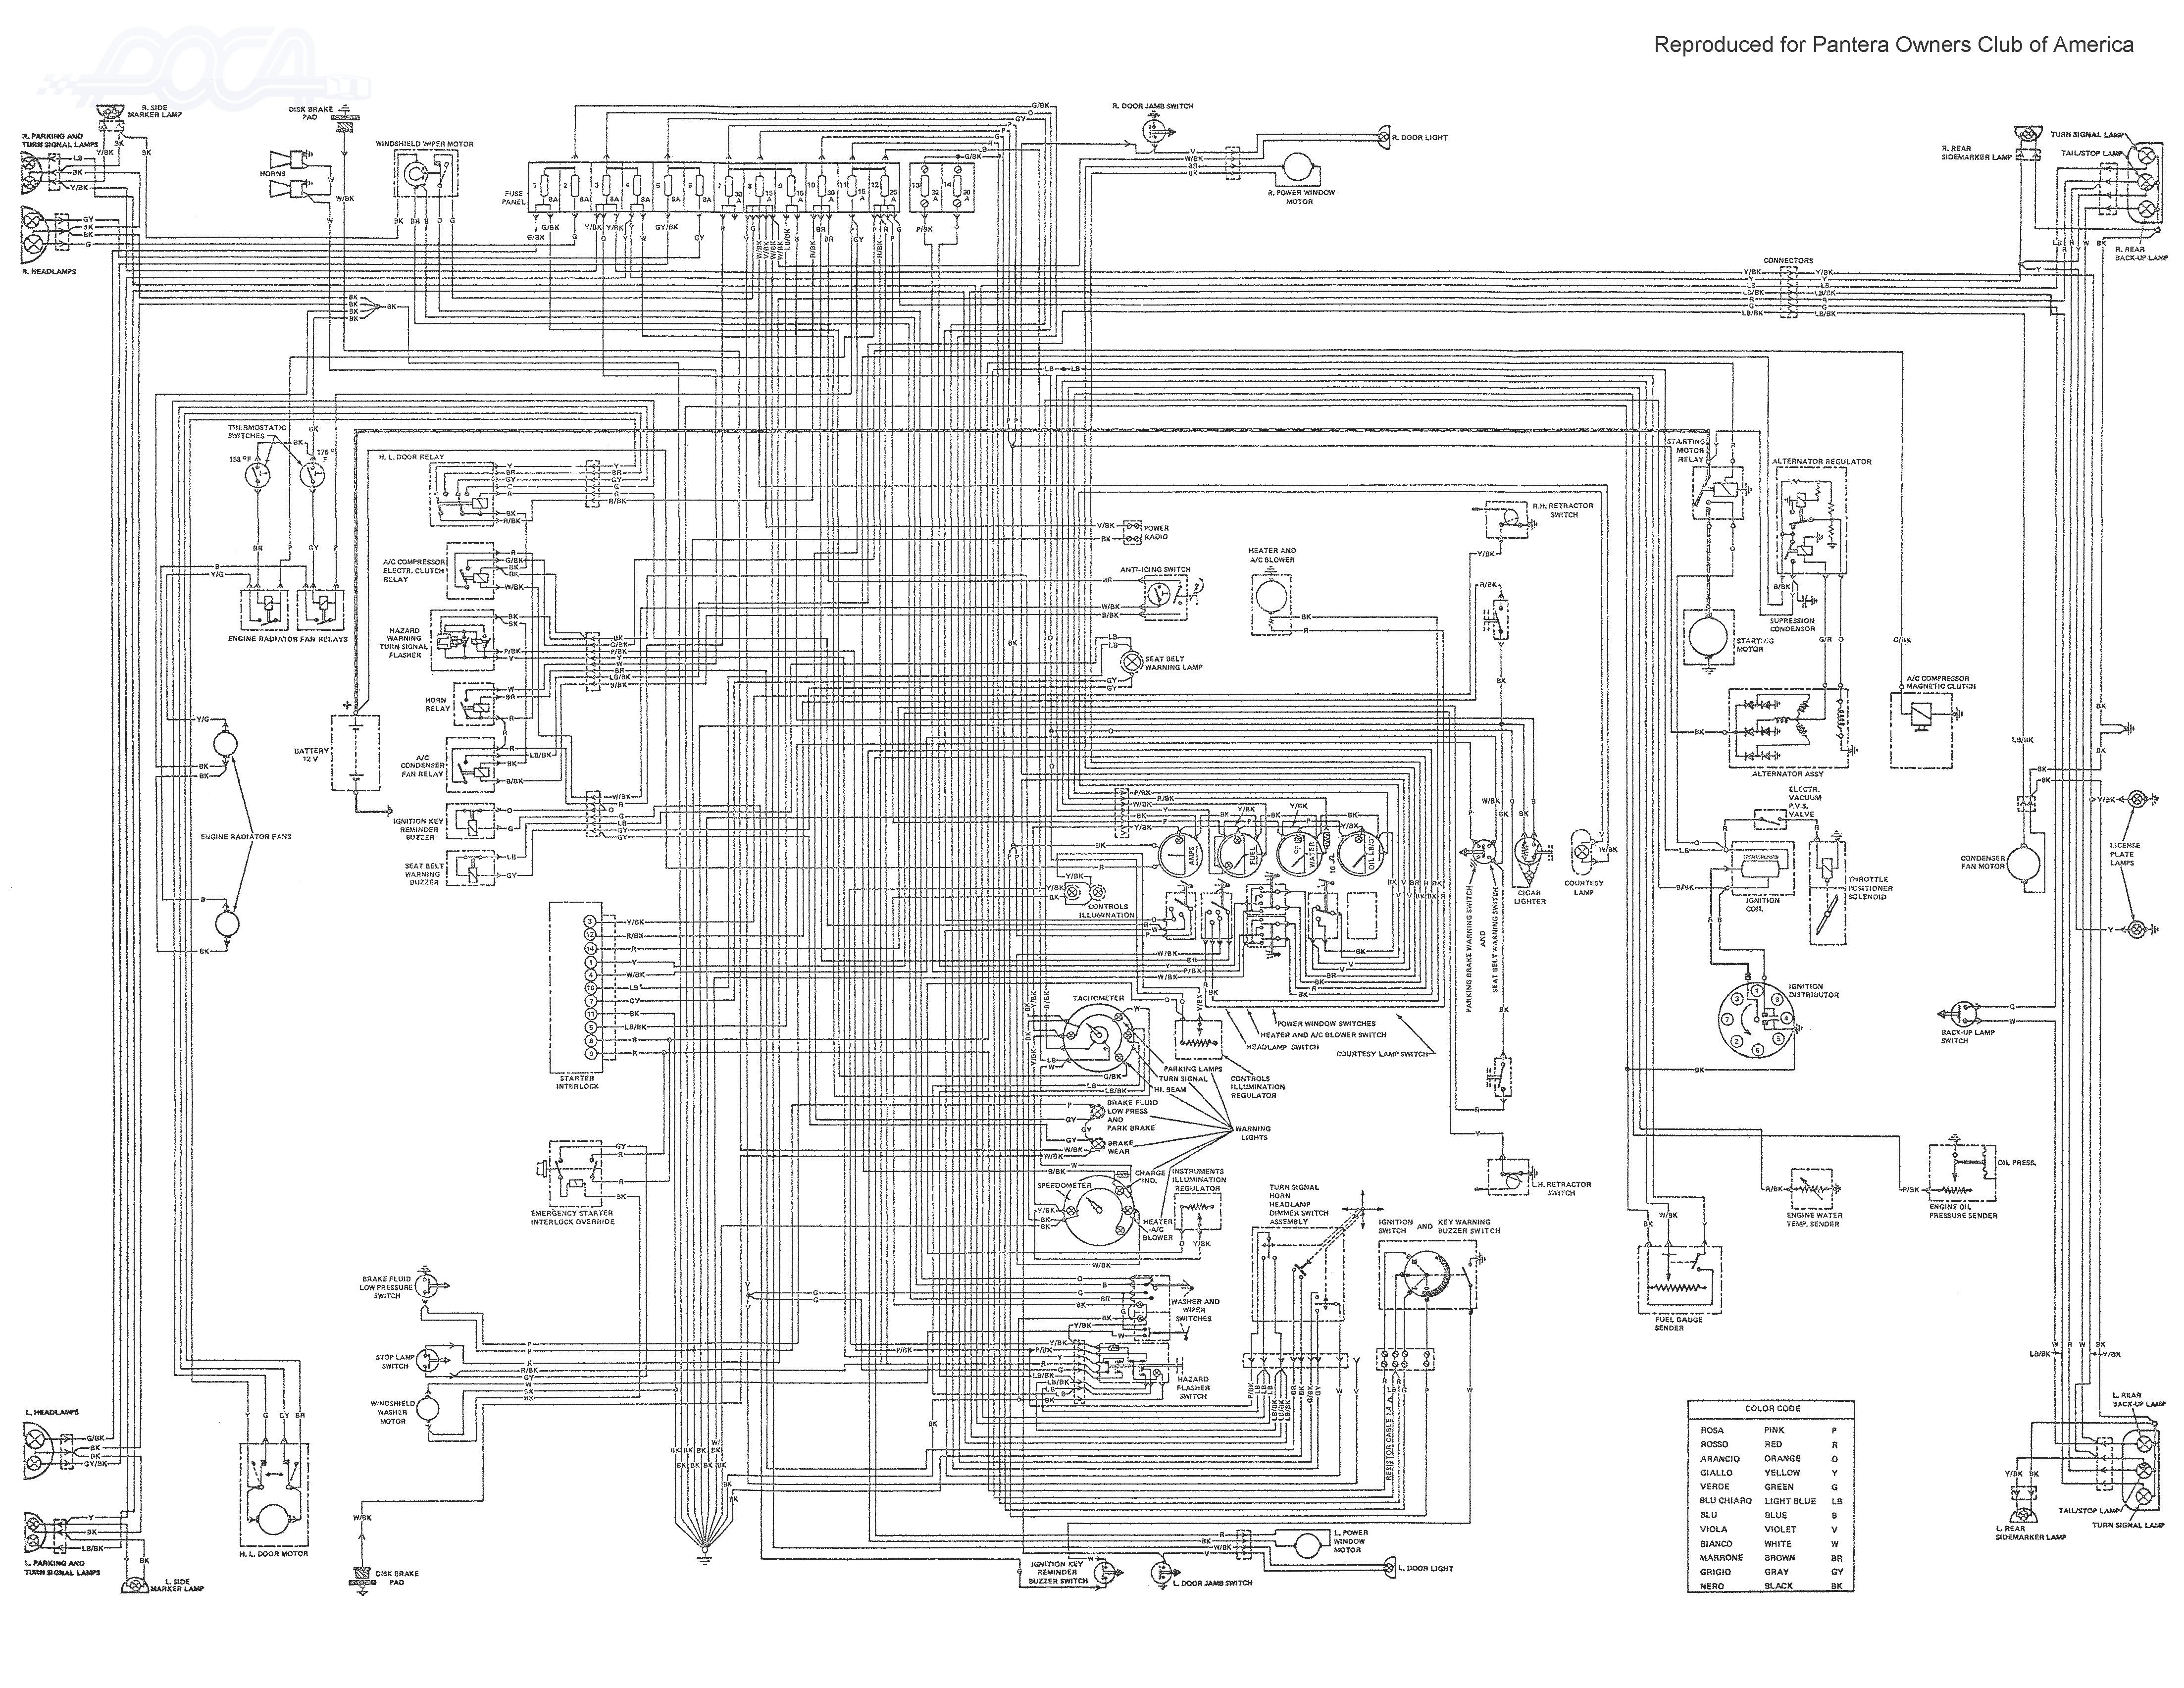 wiring diagram international 4900 series free download wiring diagram kenworth wiring diagram wiring diagram for international 4300 eureka altima belt microsoft furthermore international 4200 wiring diagram additionally international